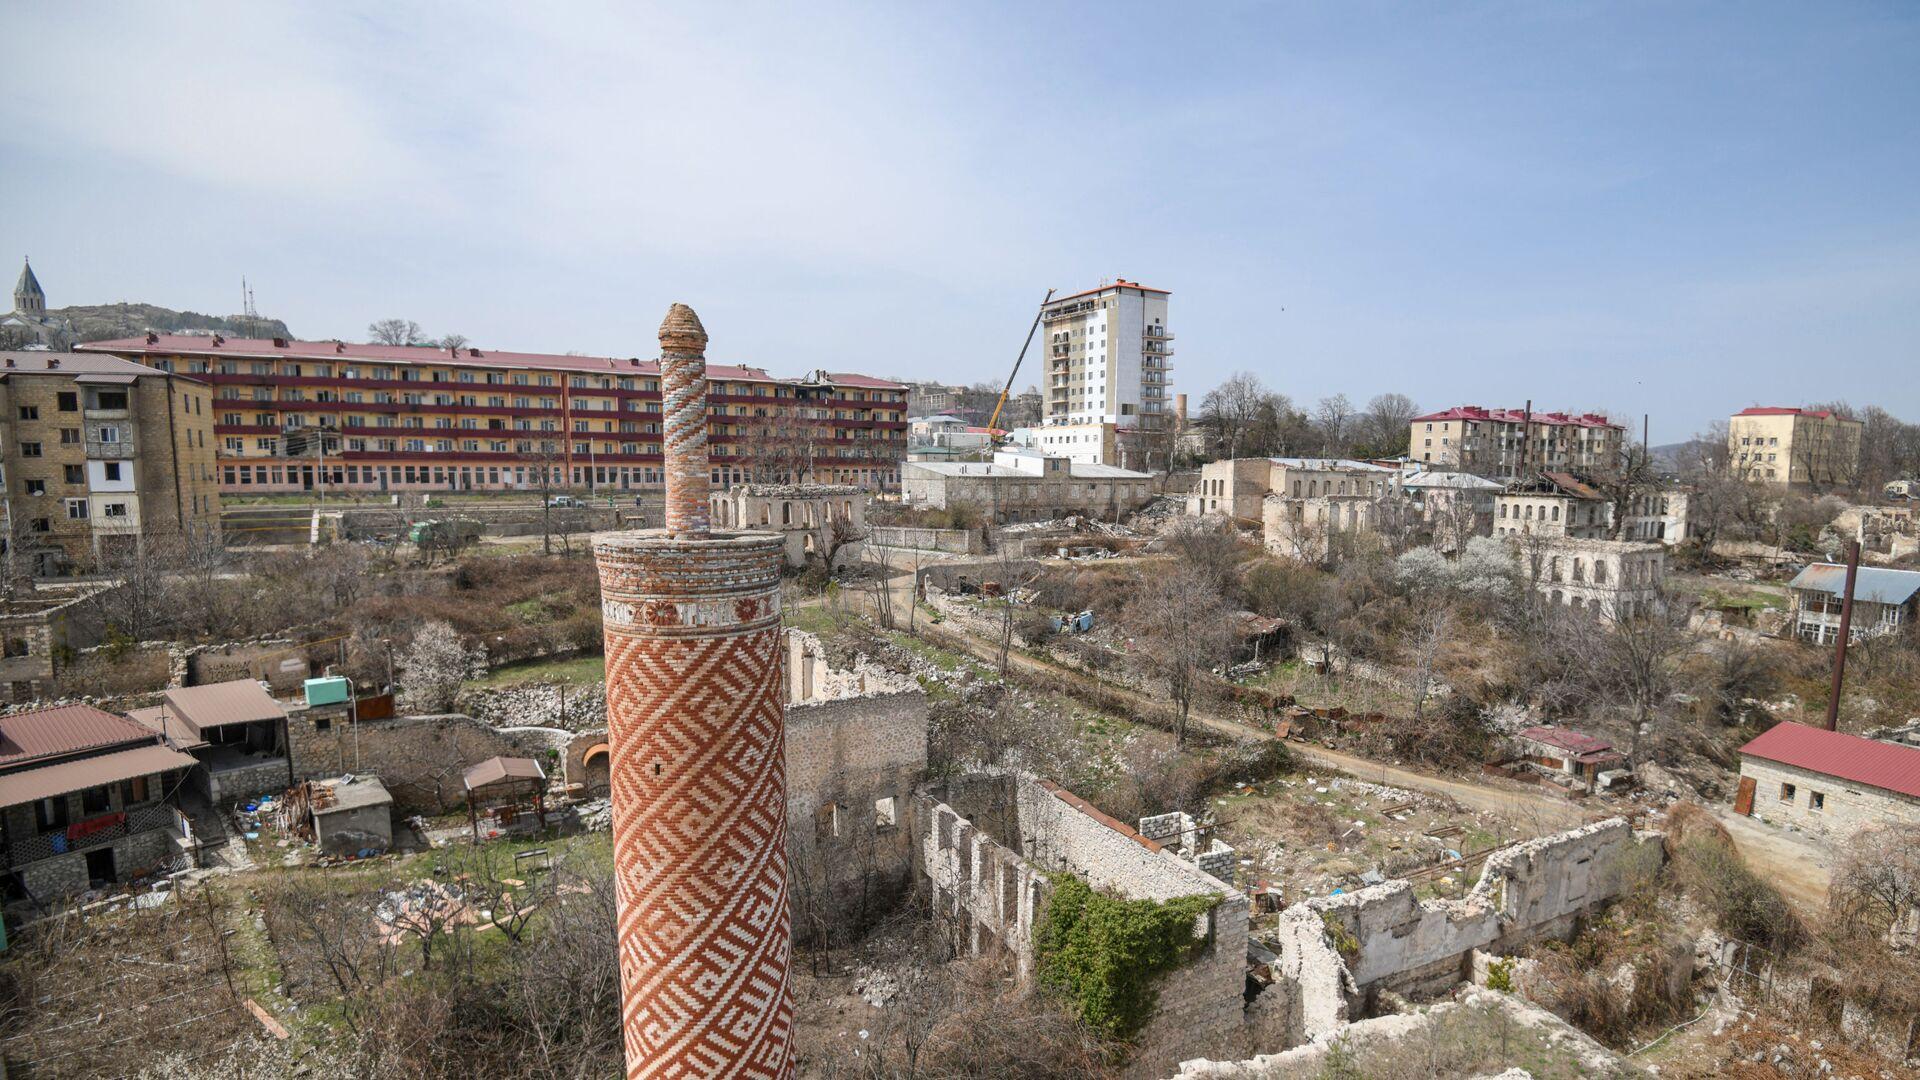 Вид на город Шуша, фото из архива - Sputnik Азербайджан, 1920, 14.10.2021